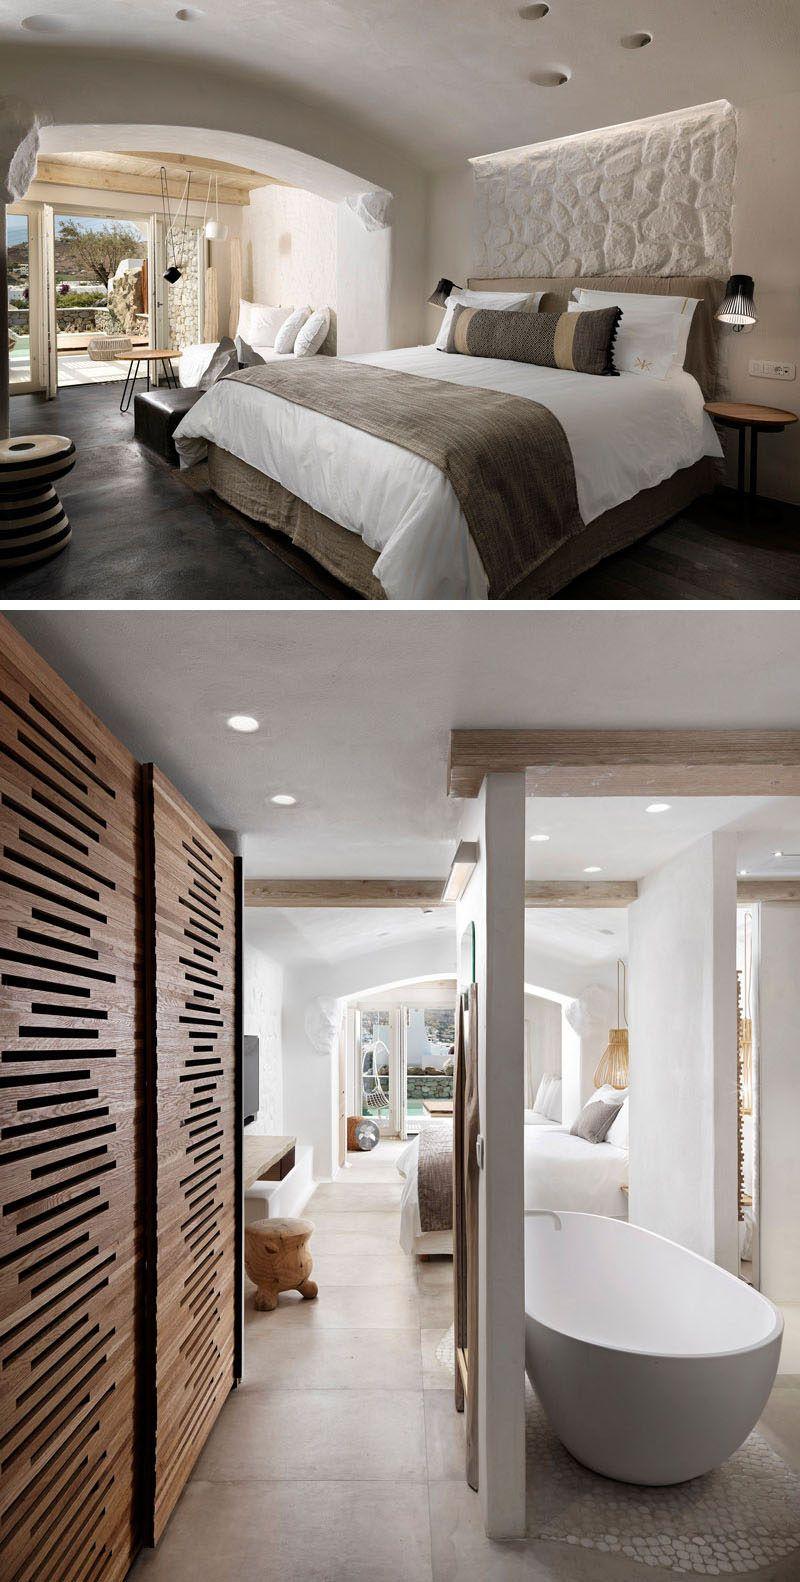 Kleines hotelbadezimmerdesign kensho a new boutique design hotel has opened its doors in mykonos